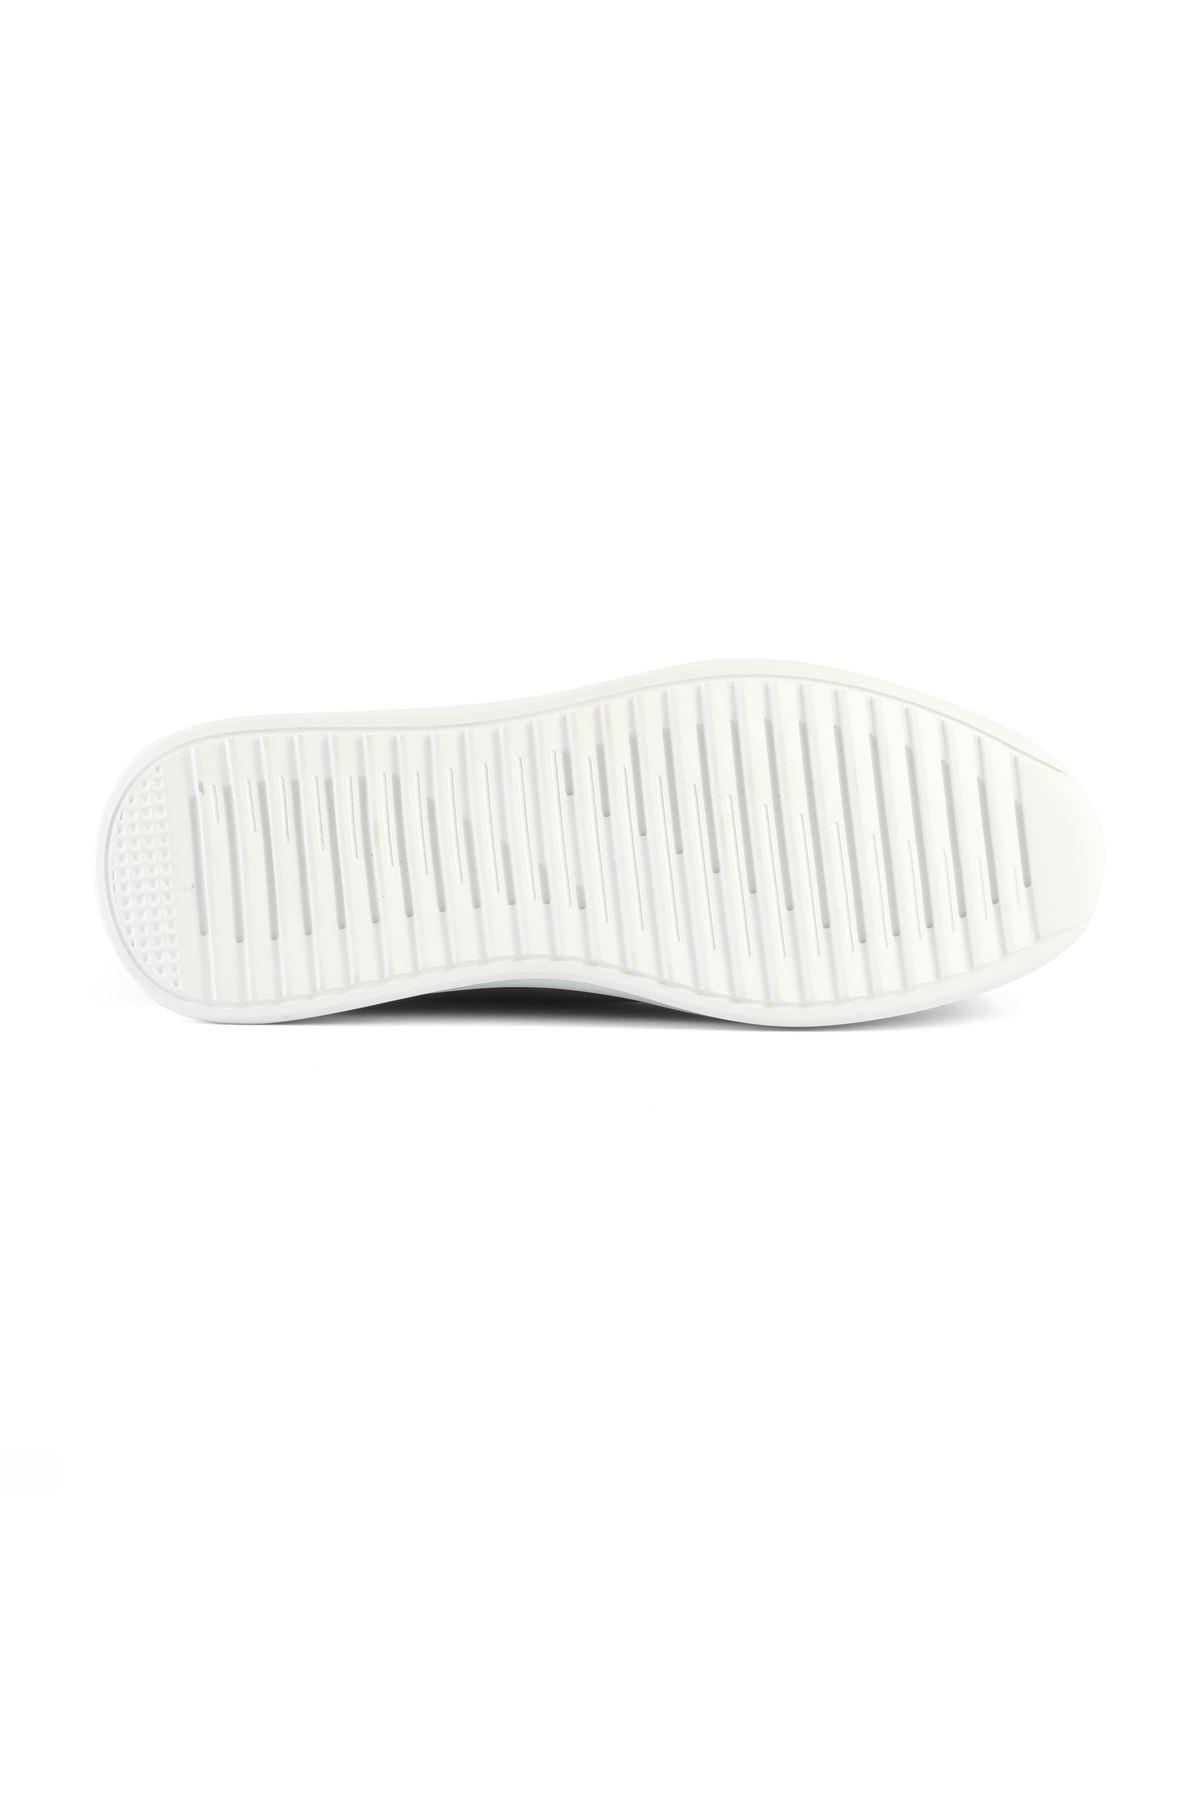 Libero L3411 Black Sneaker Shoes